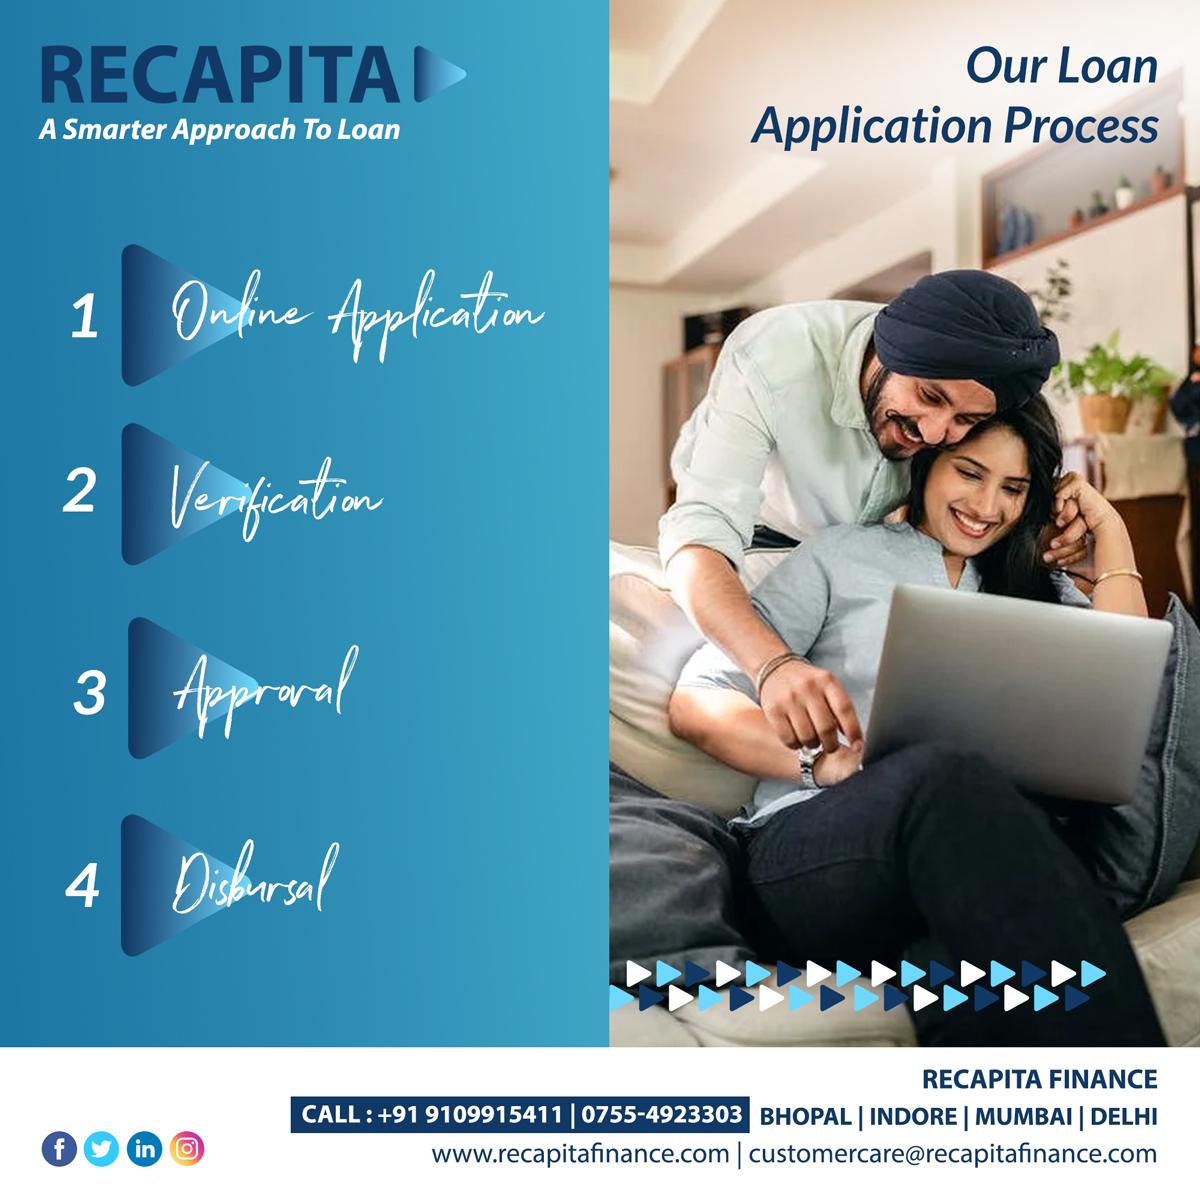 recapita-loan-application-process.jpg